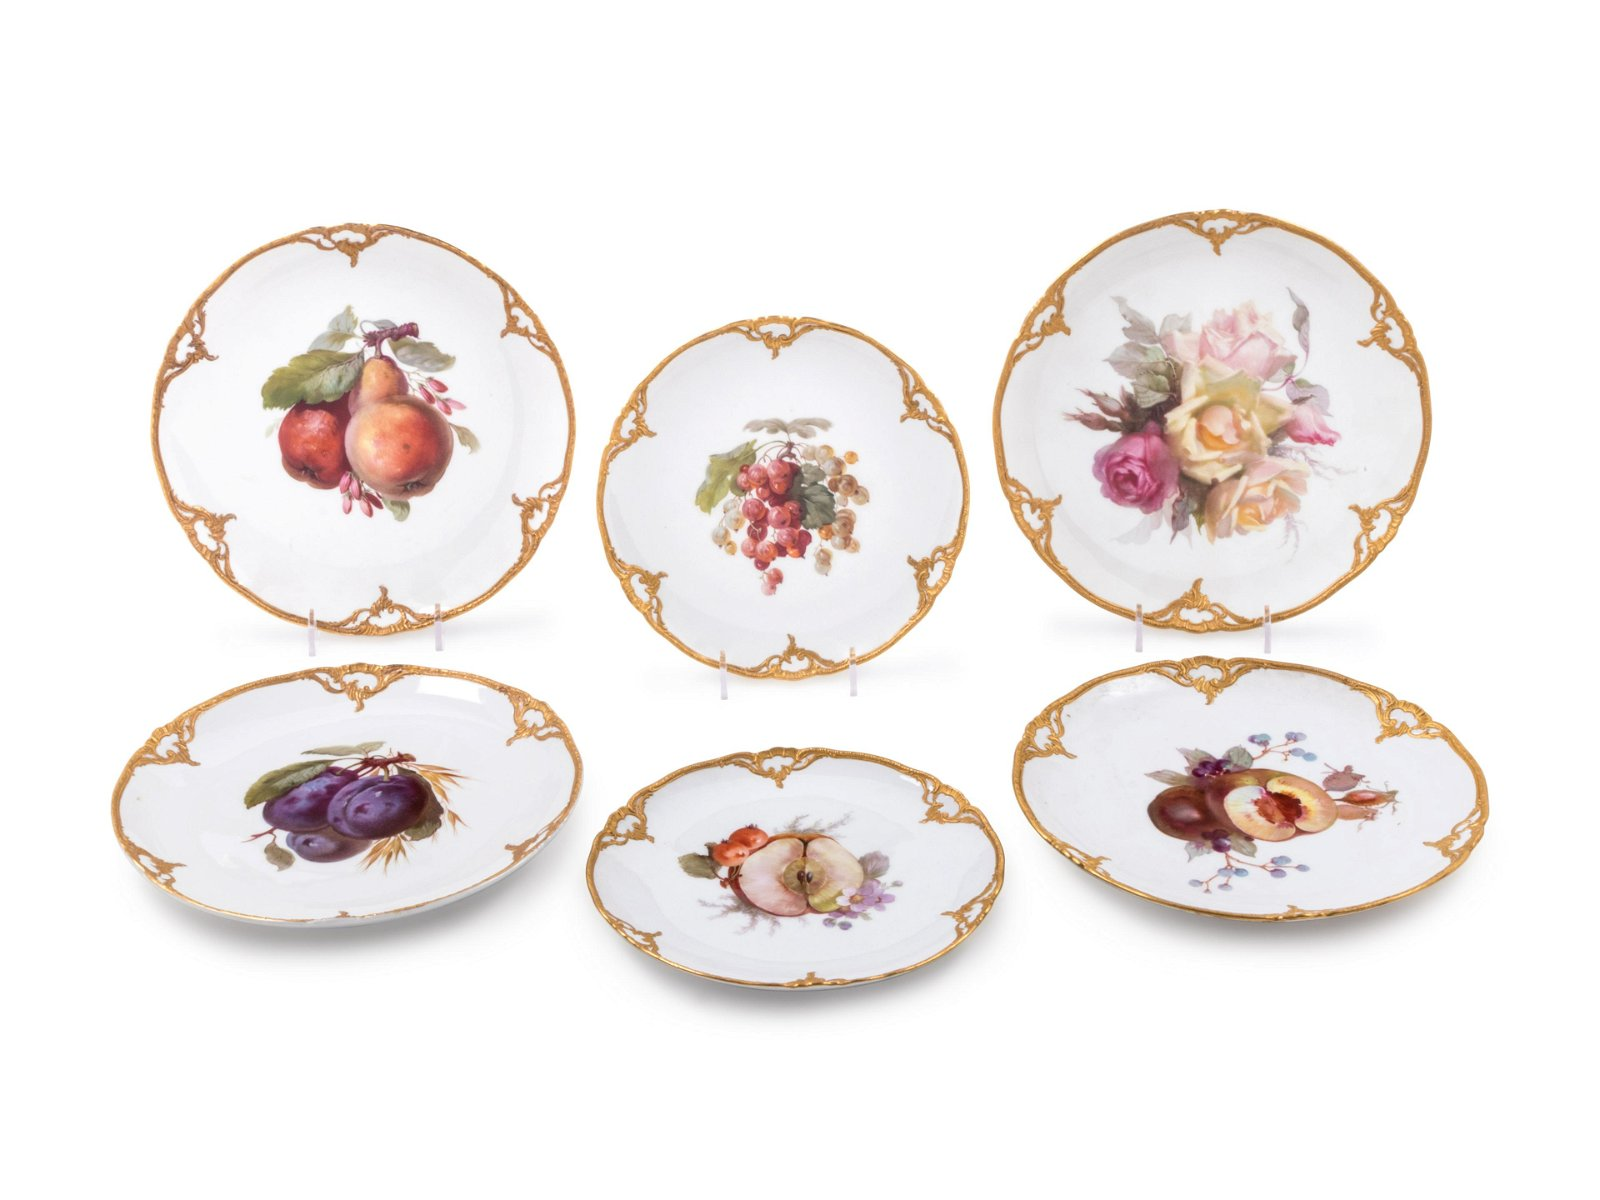 A Set of Twenty-Seven Berlin (K.P.M.) Porcelain Plates